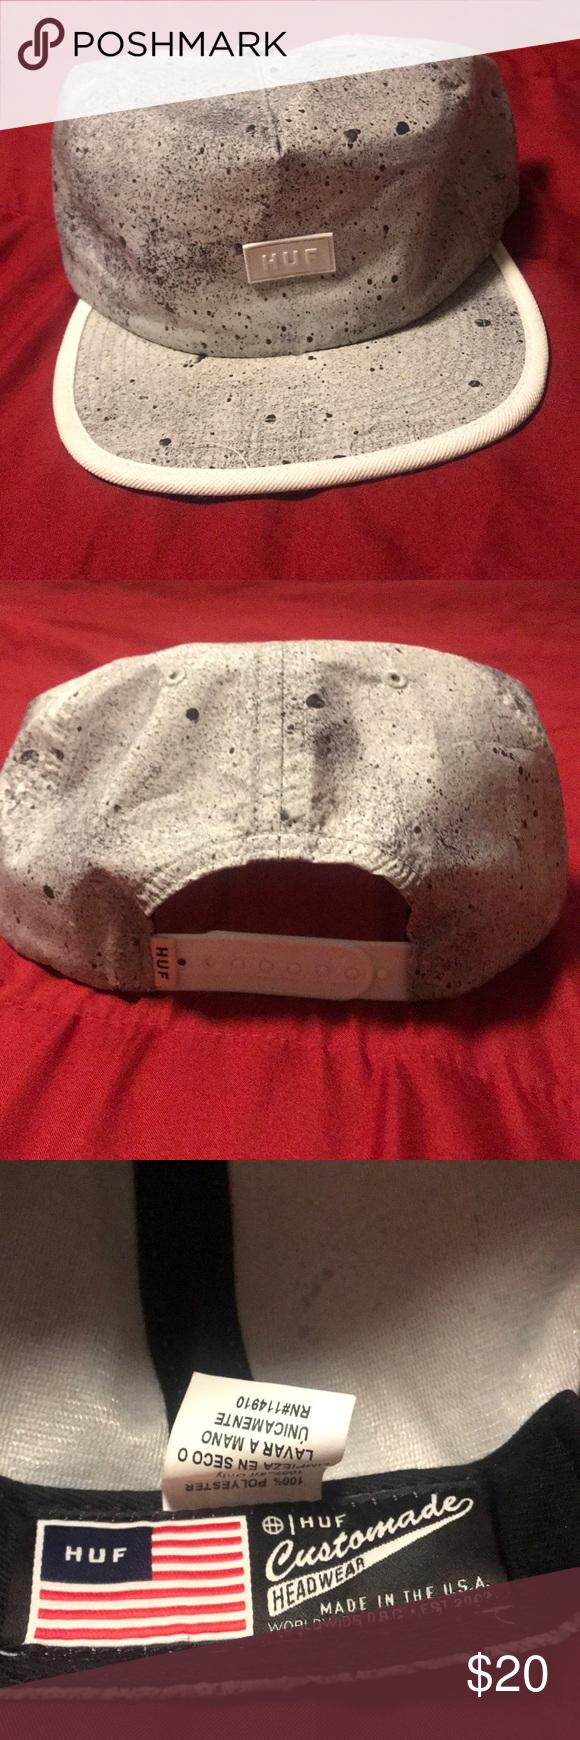 0716b99f Huf SnapBack hat Grey black and white HUF Accessories Hats   My Posh ...